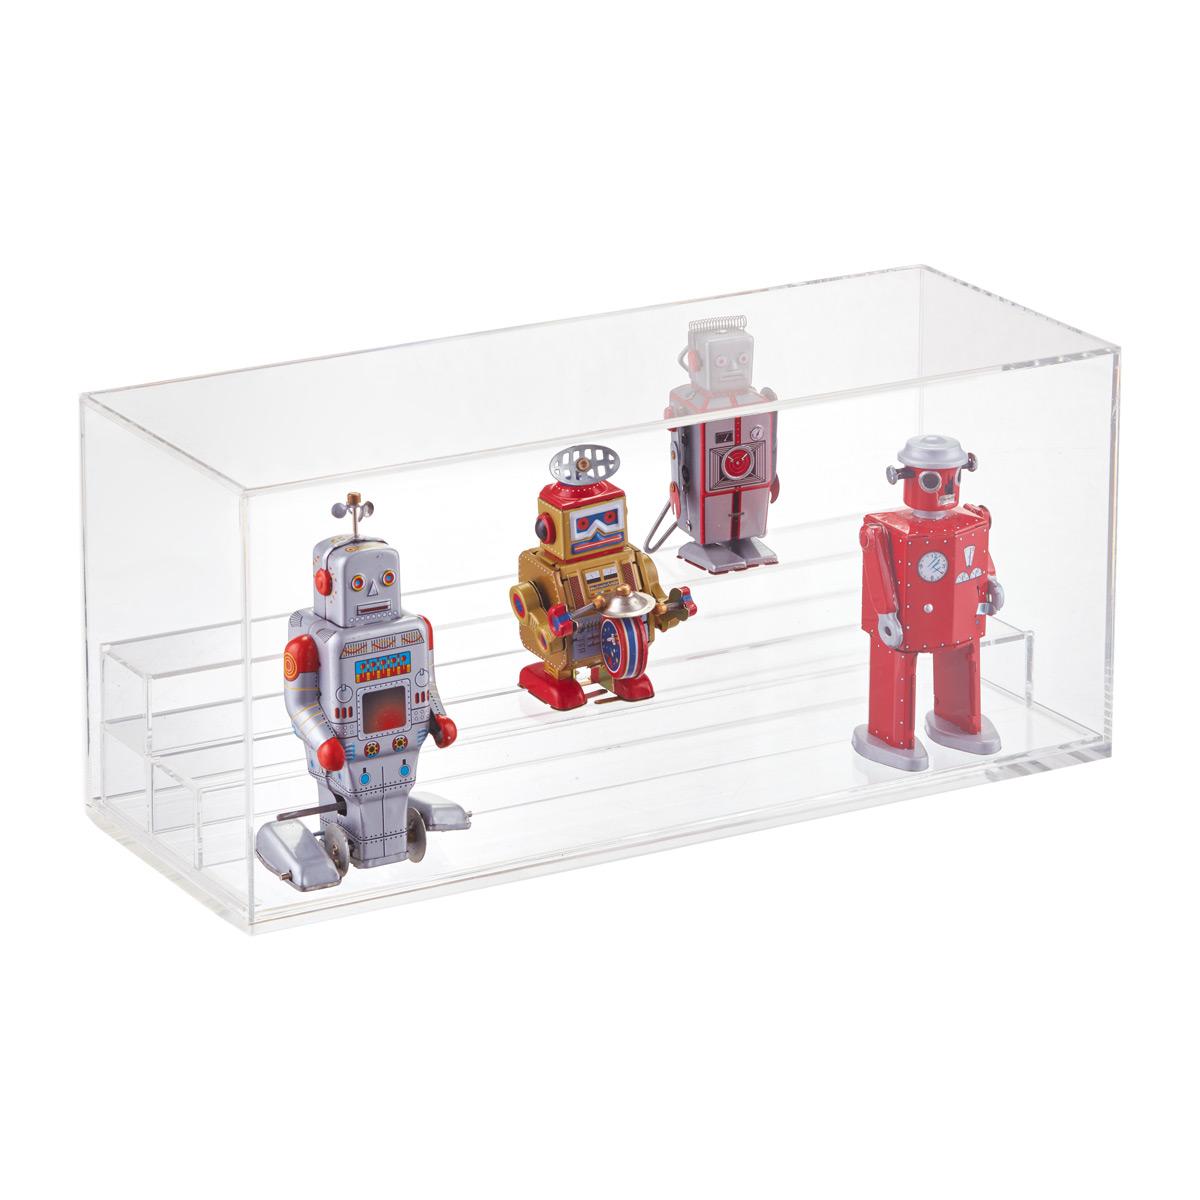 Medium Modular Clear Acrylic Premium Display Case